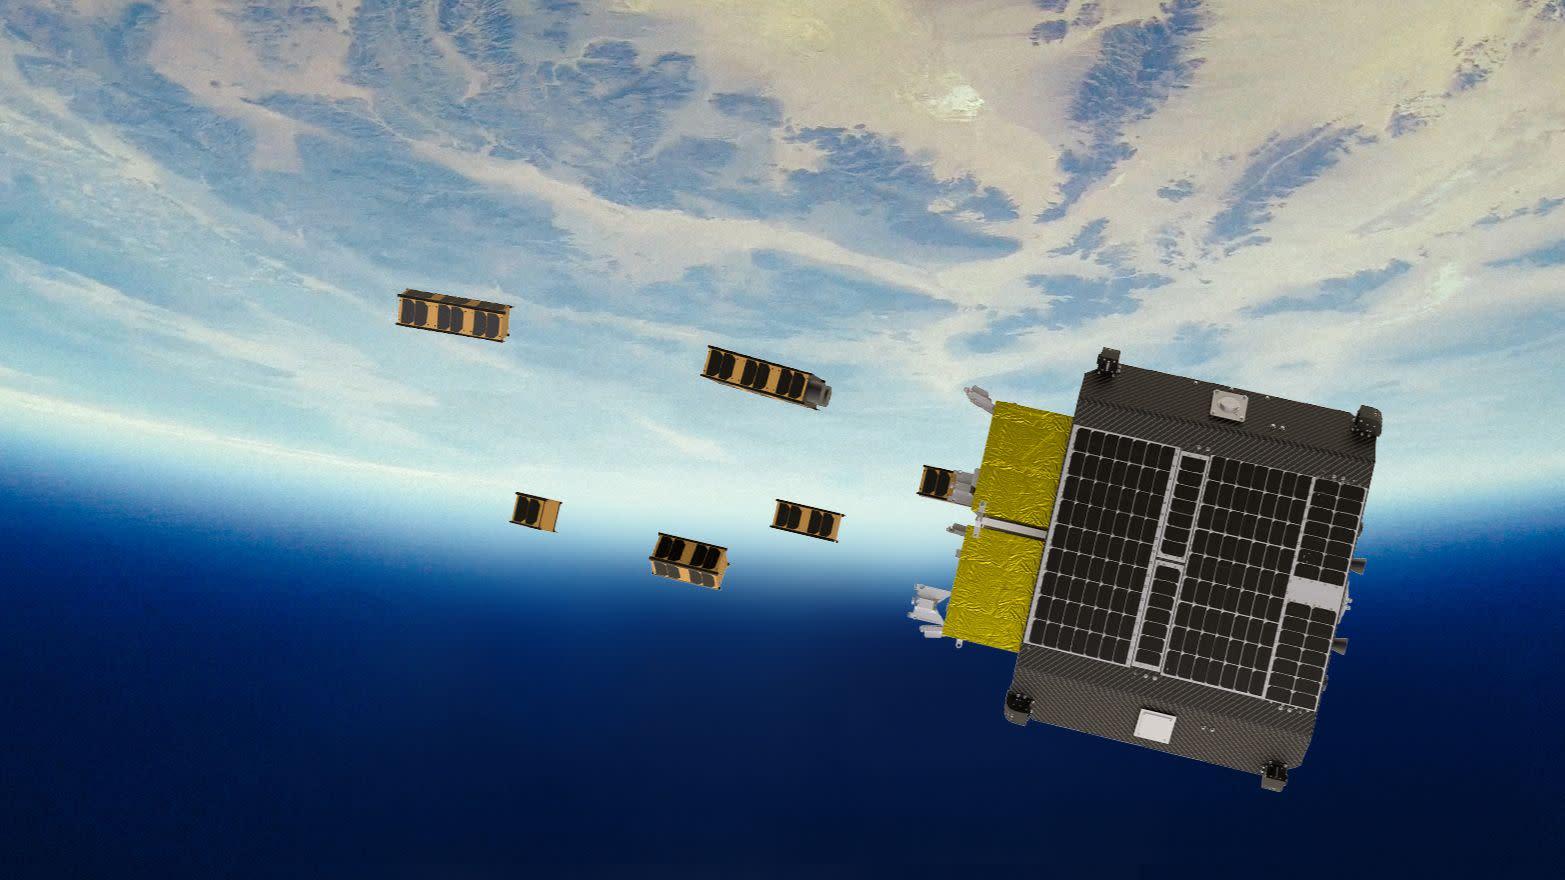 UK Space Agency funds tech for orbital awareness